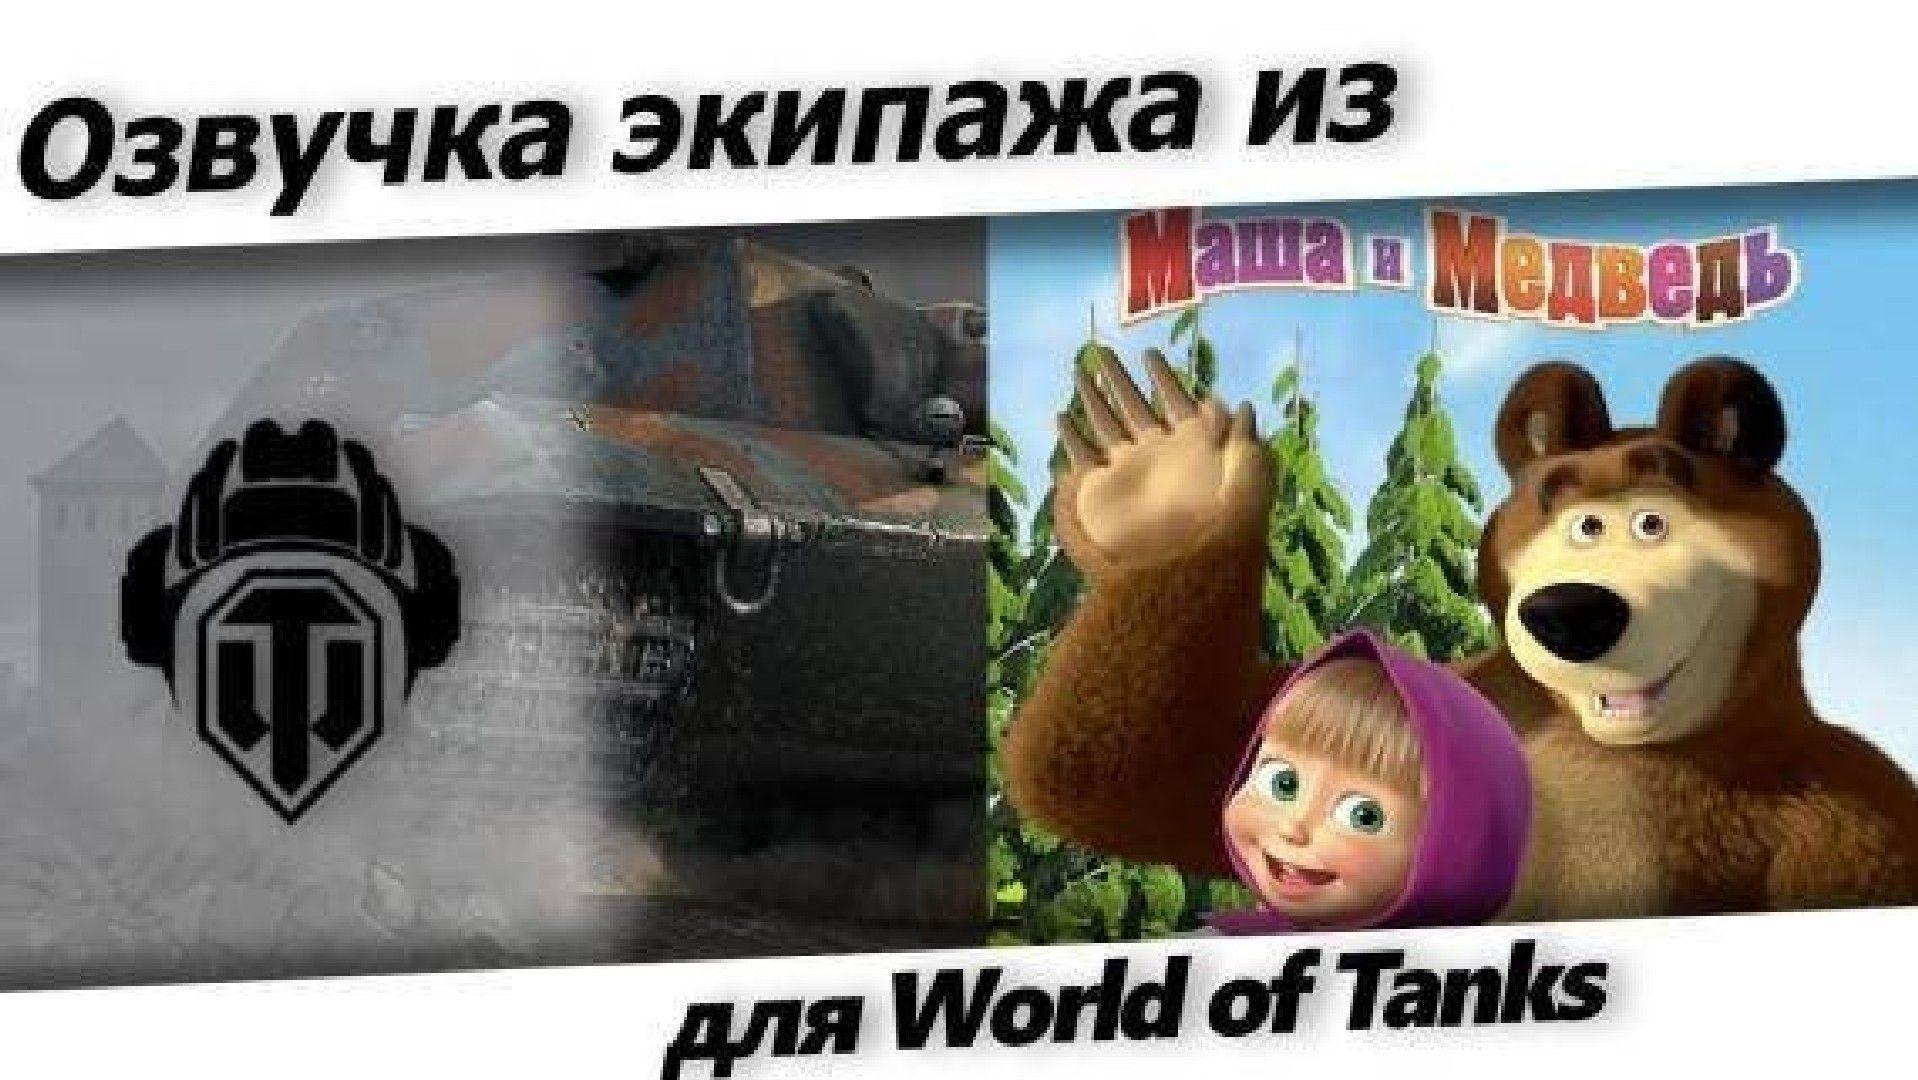 озвучку экипажа маша и медведь world of tanks.